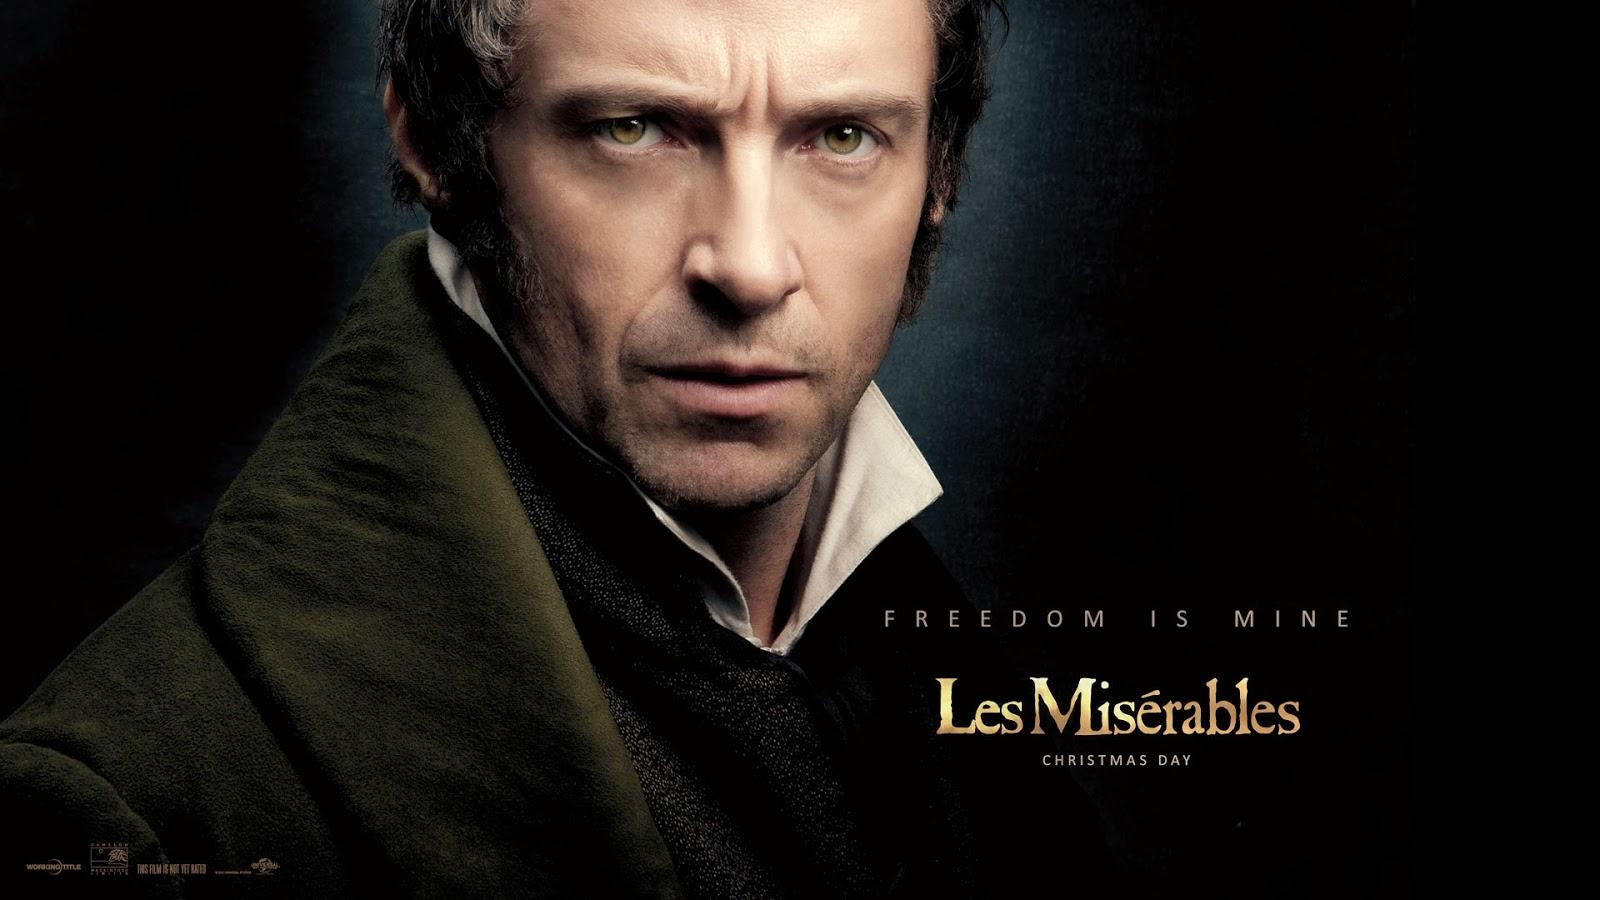 Les Miserables | 7 Film yang Wajib Ditonton Entrepreneur